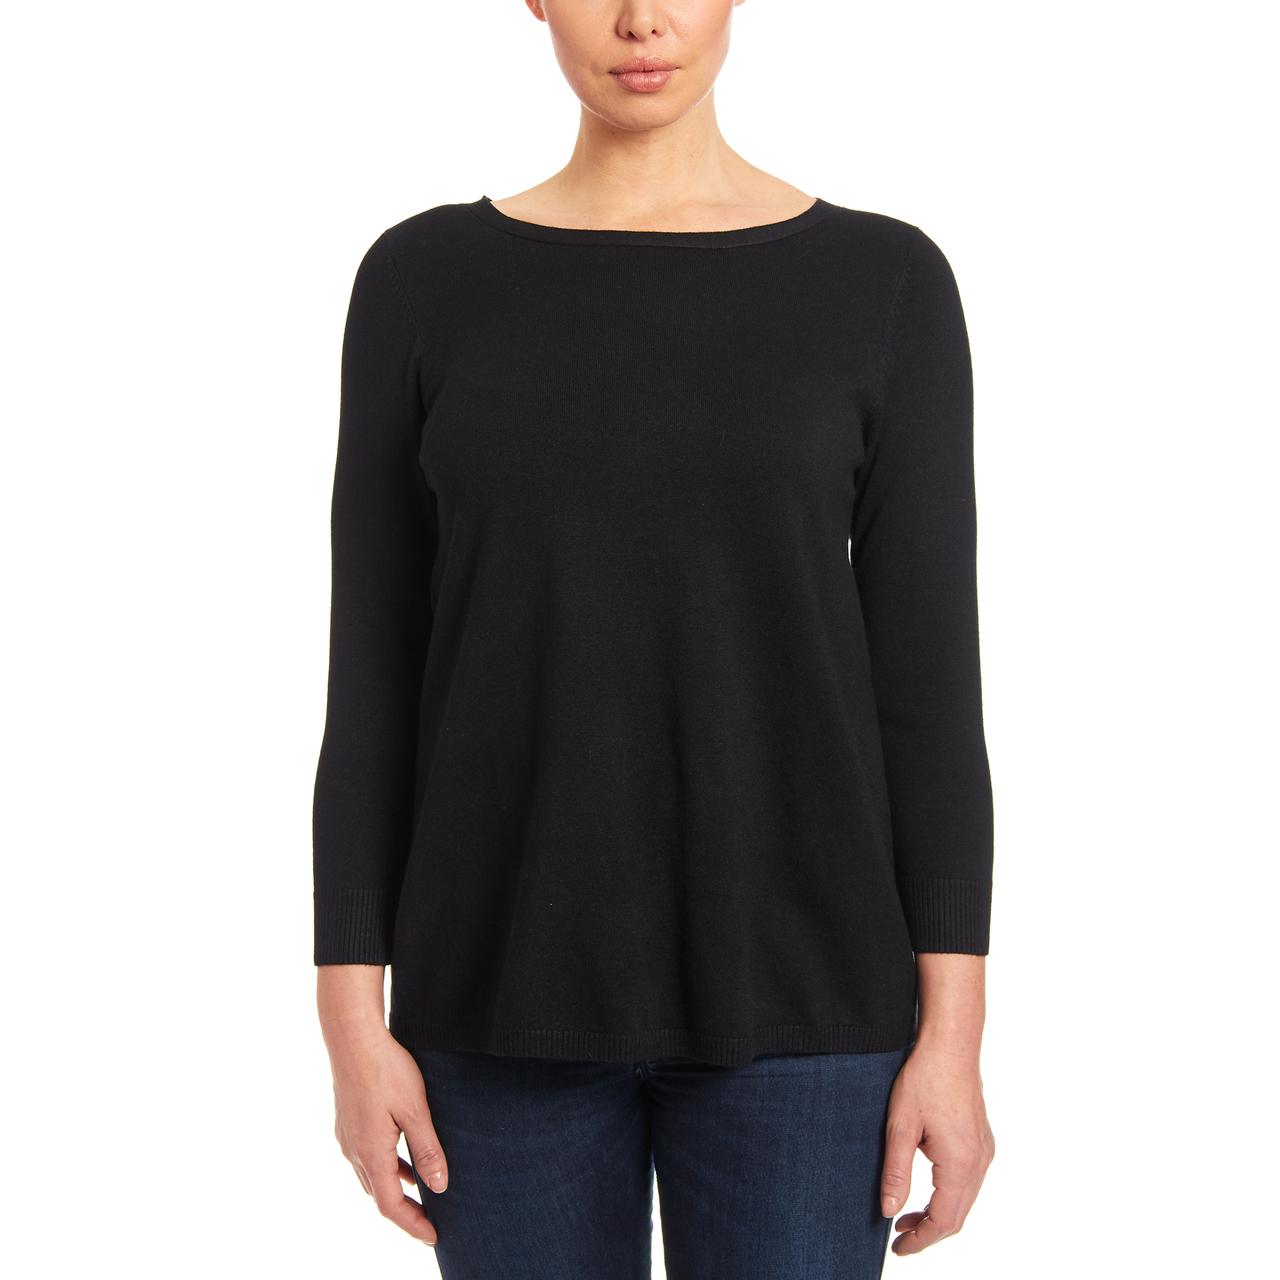 Crewneck Keyhole Tunic Sweater in Black